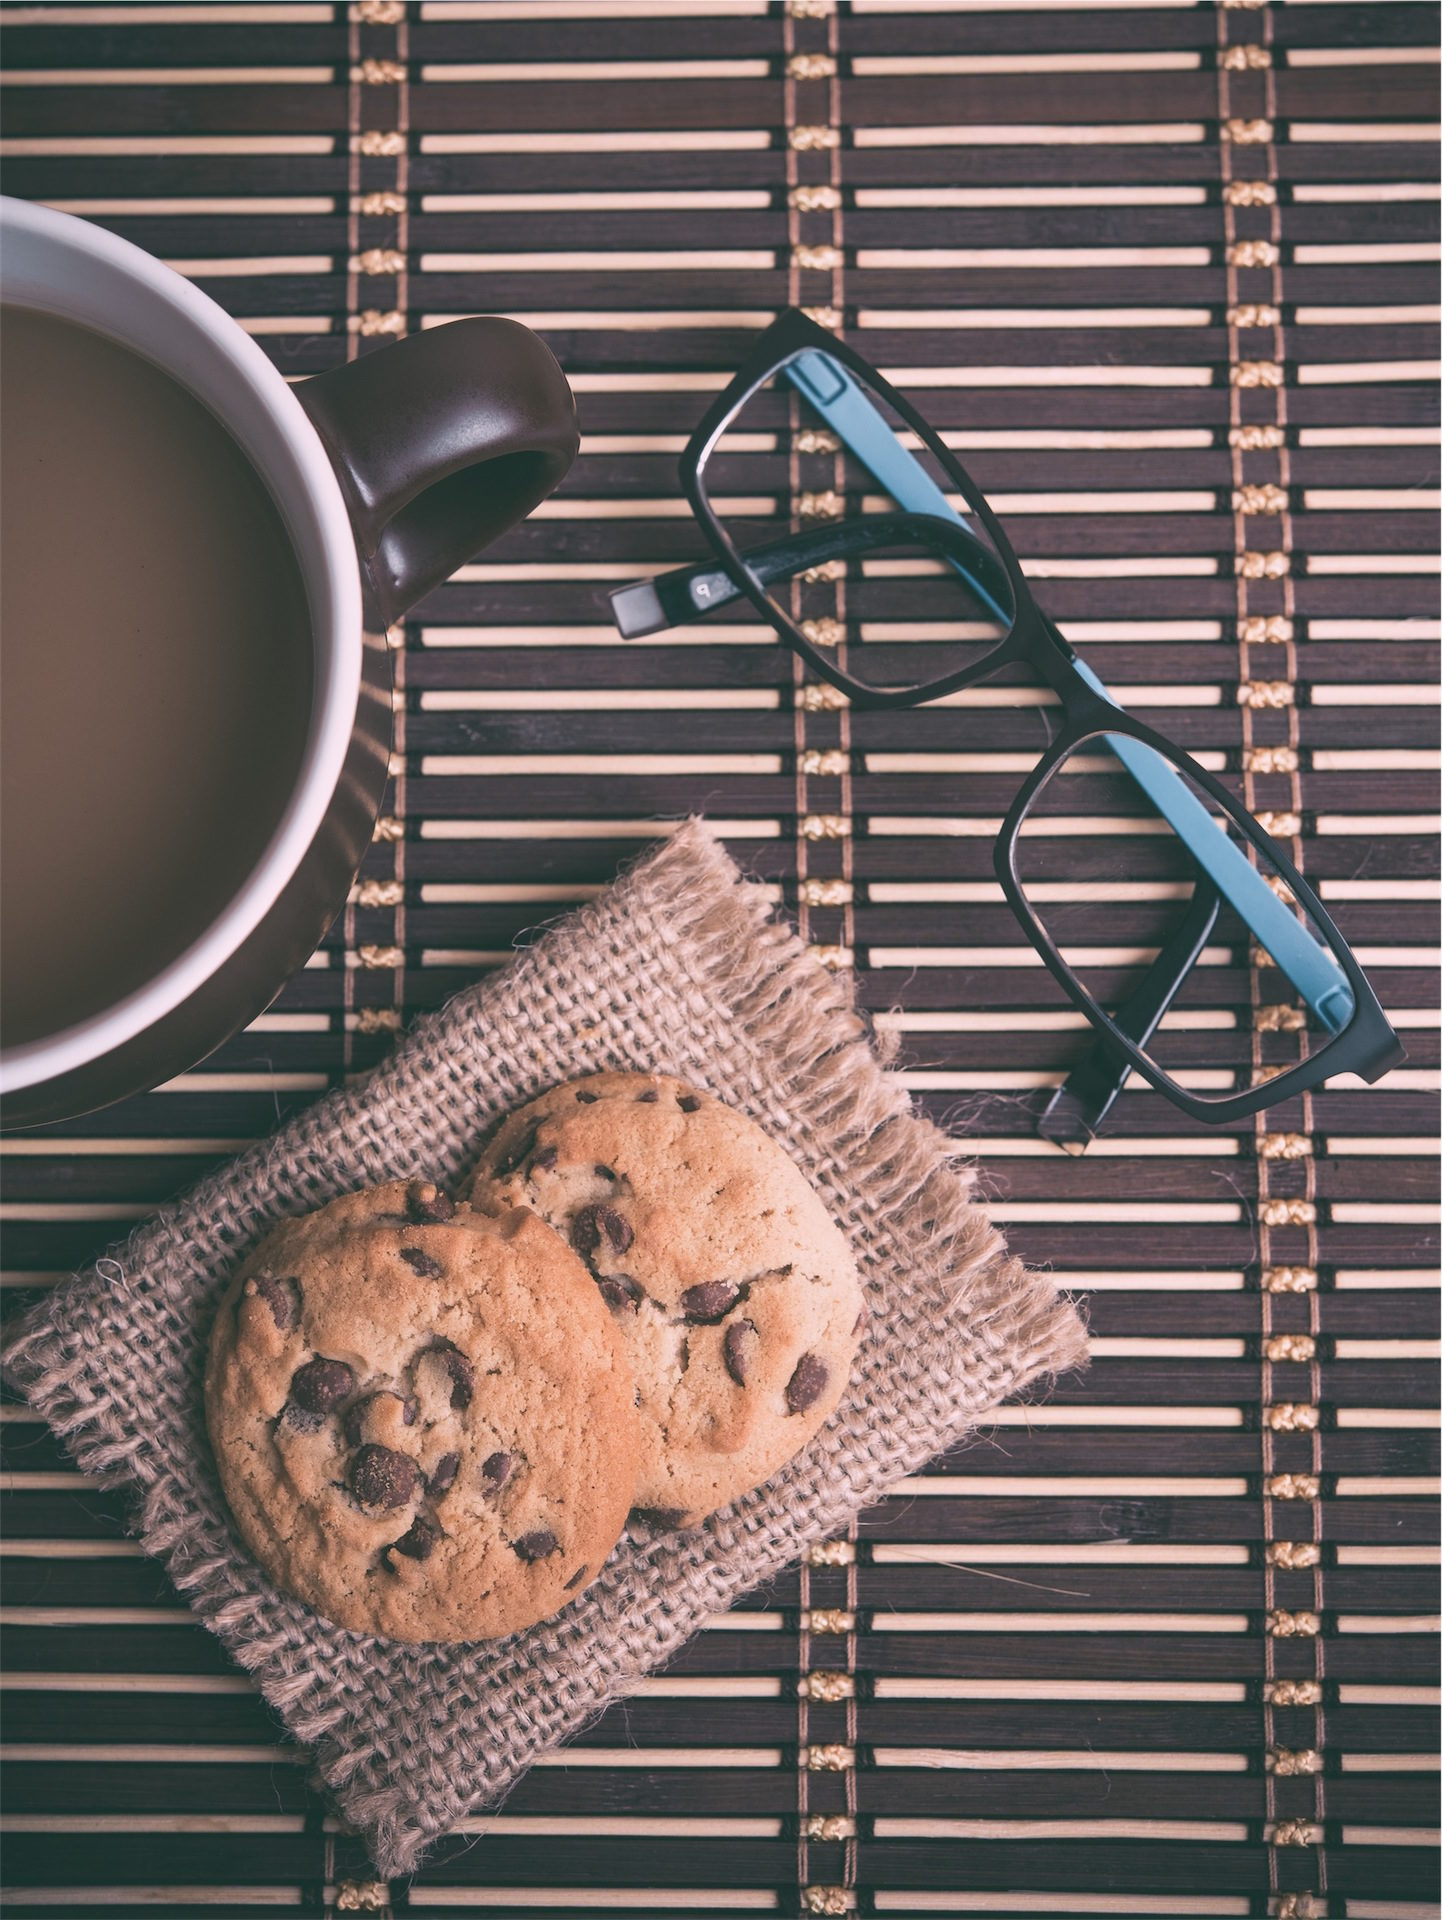 कप, कॉफी, कुकीज़, धूप का चश्मा, नाश्ता - HD वॉलपेपर - प्रोफेसर-falken.com